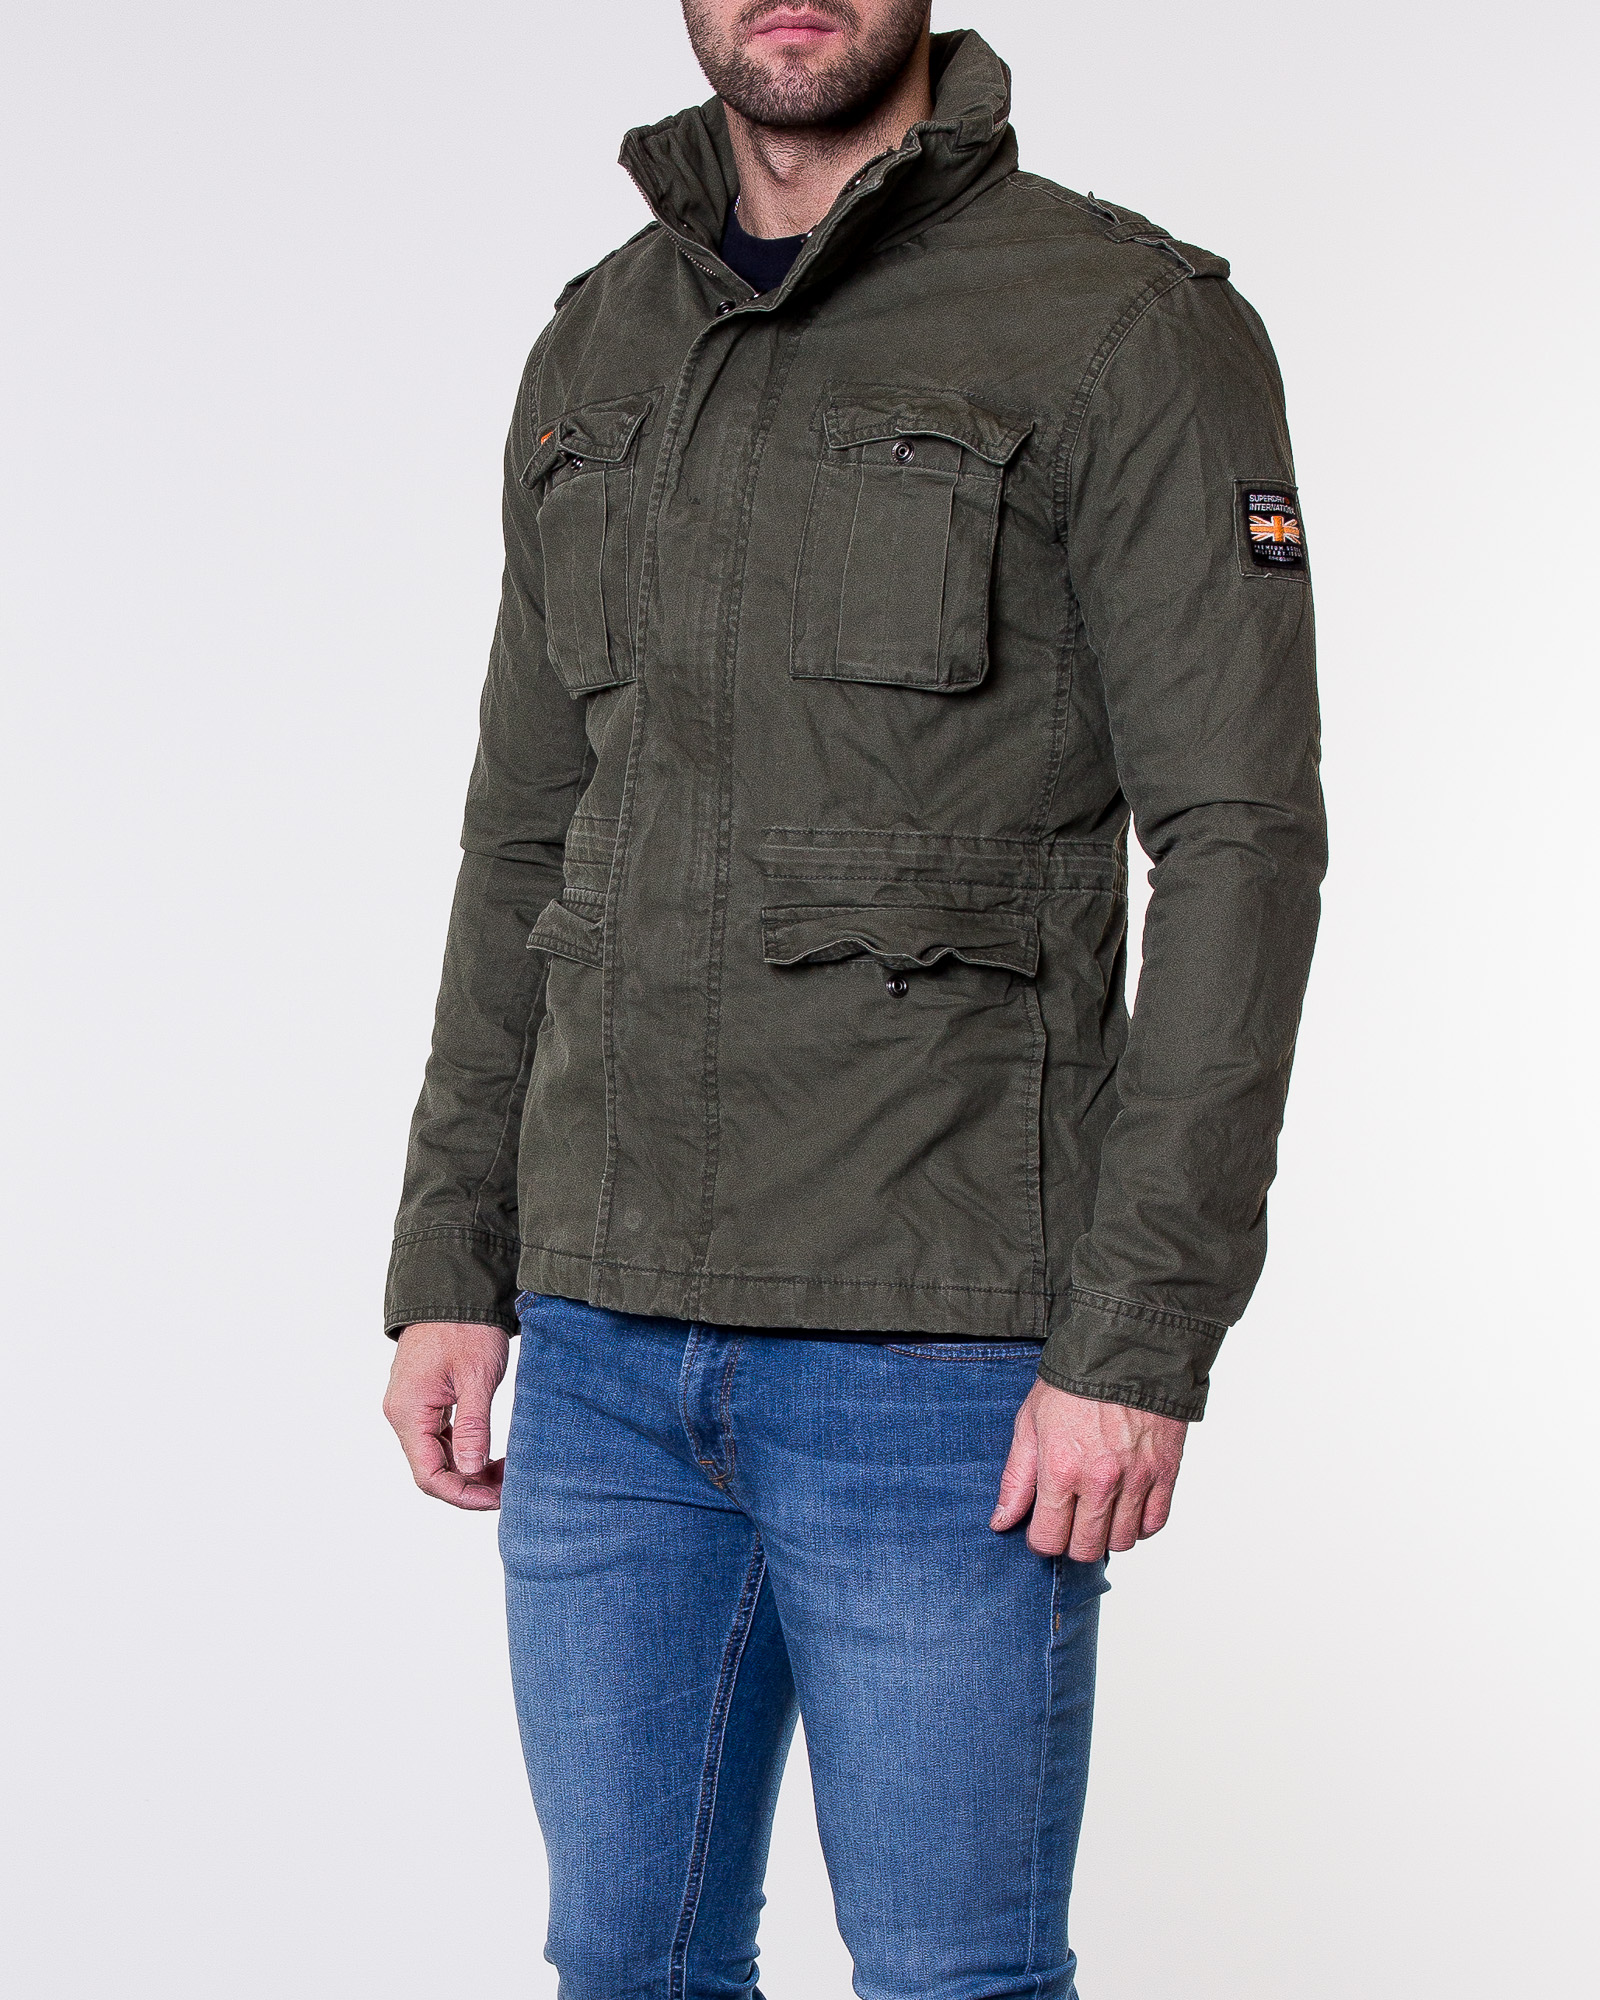 pretty nice 8ee85 98658 Superdry, Classic Rookie Military Jacket Patrol Khaki ...